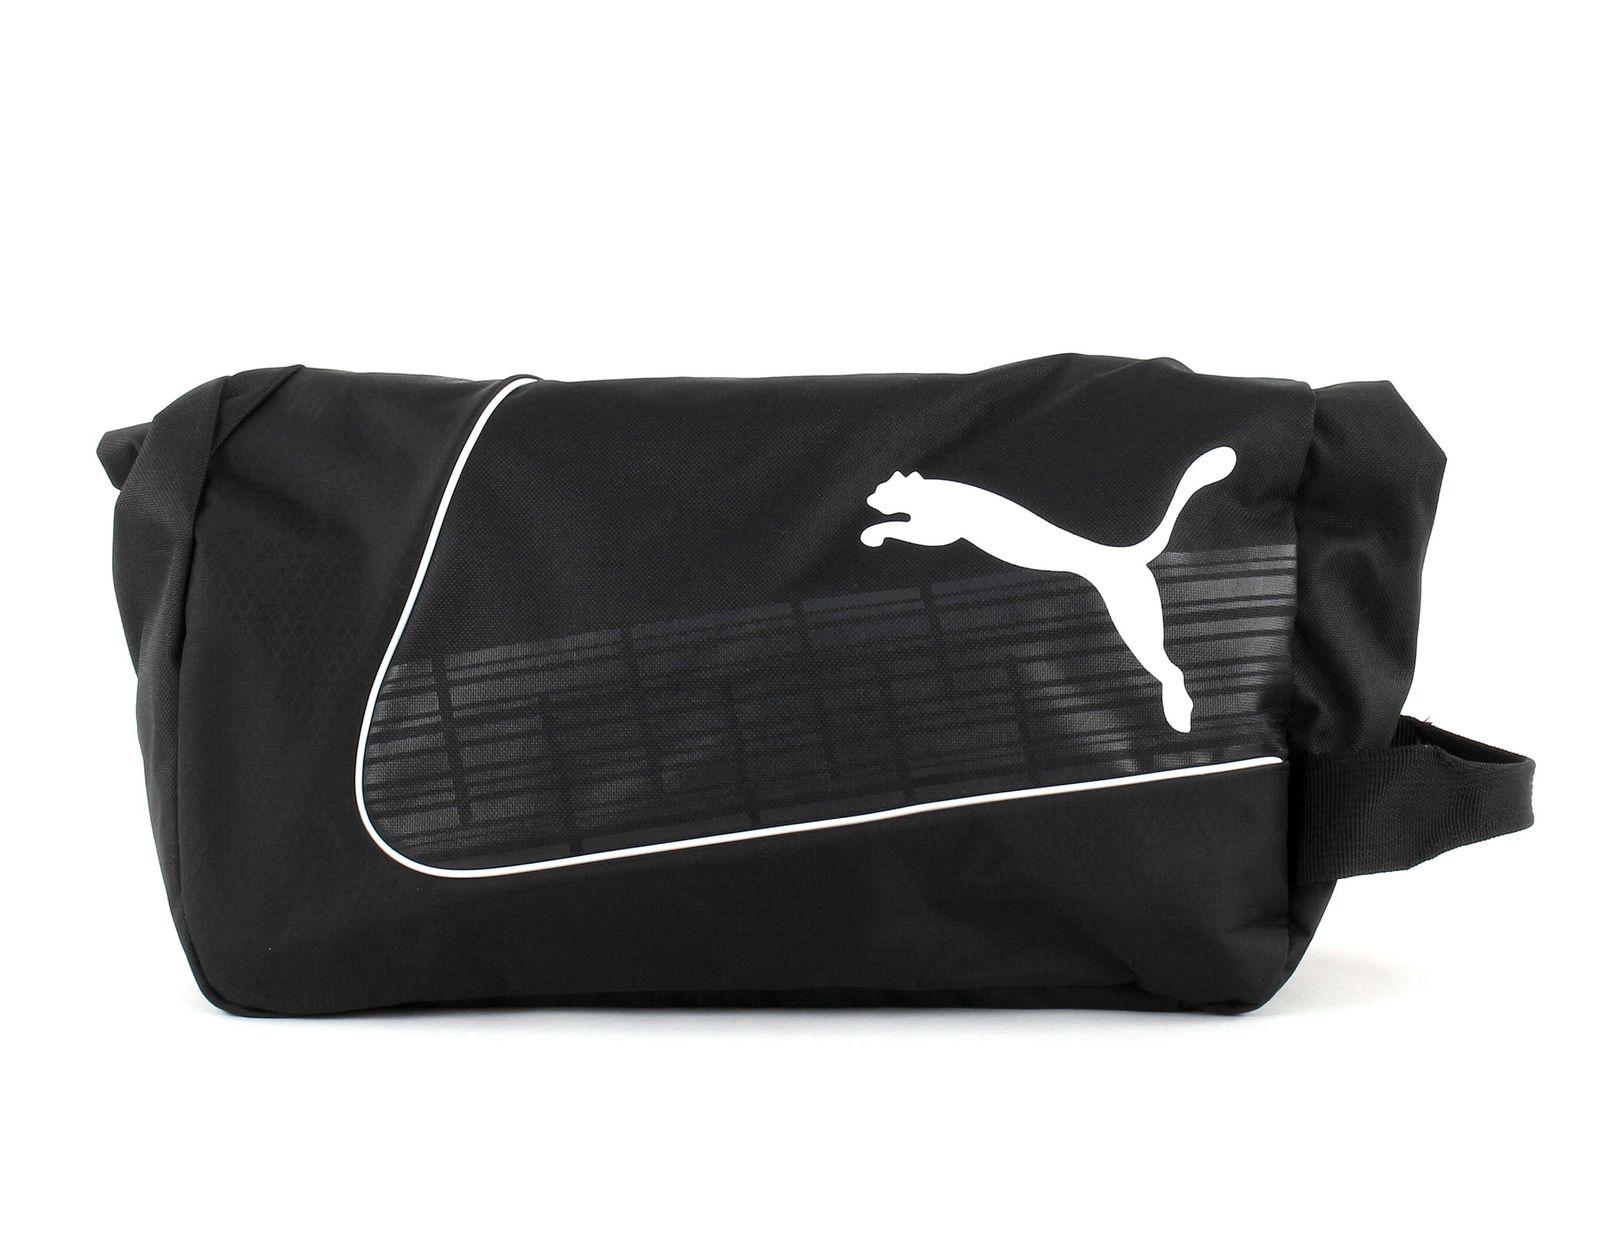 PUMA evoPOWER Shoe Bag Black-White